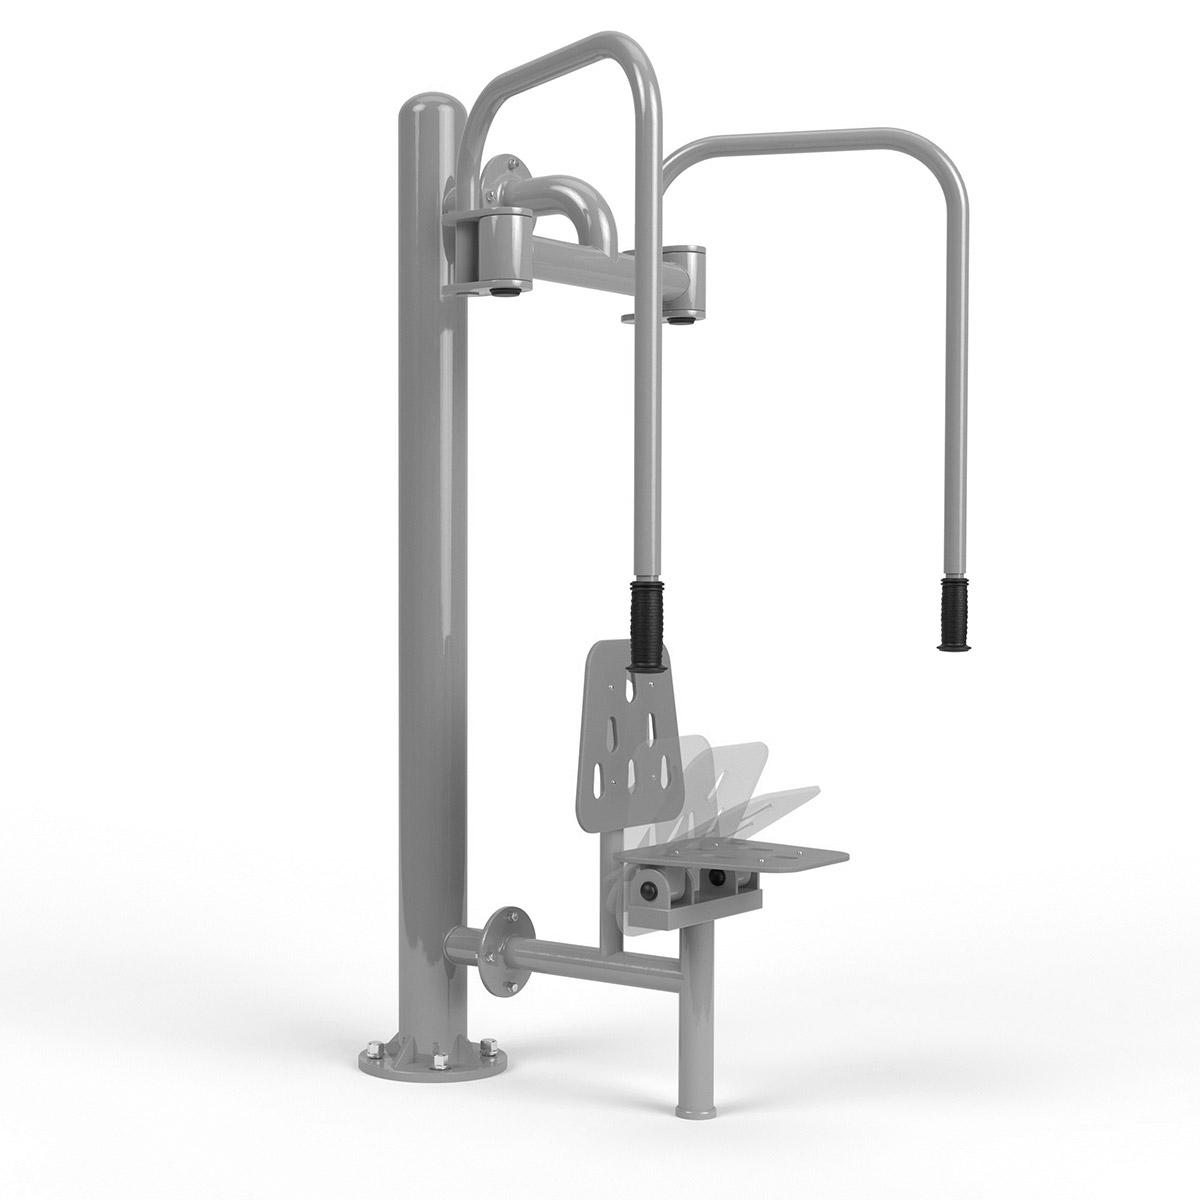 Integrierter schmetterling Edehlstahl + pole